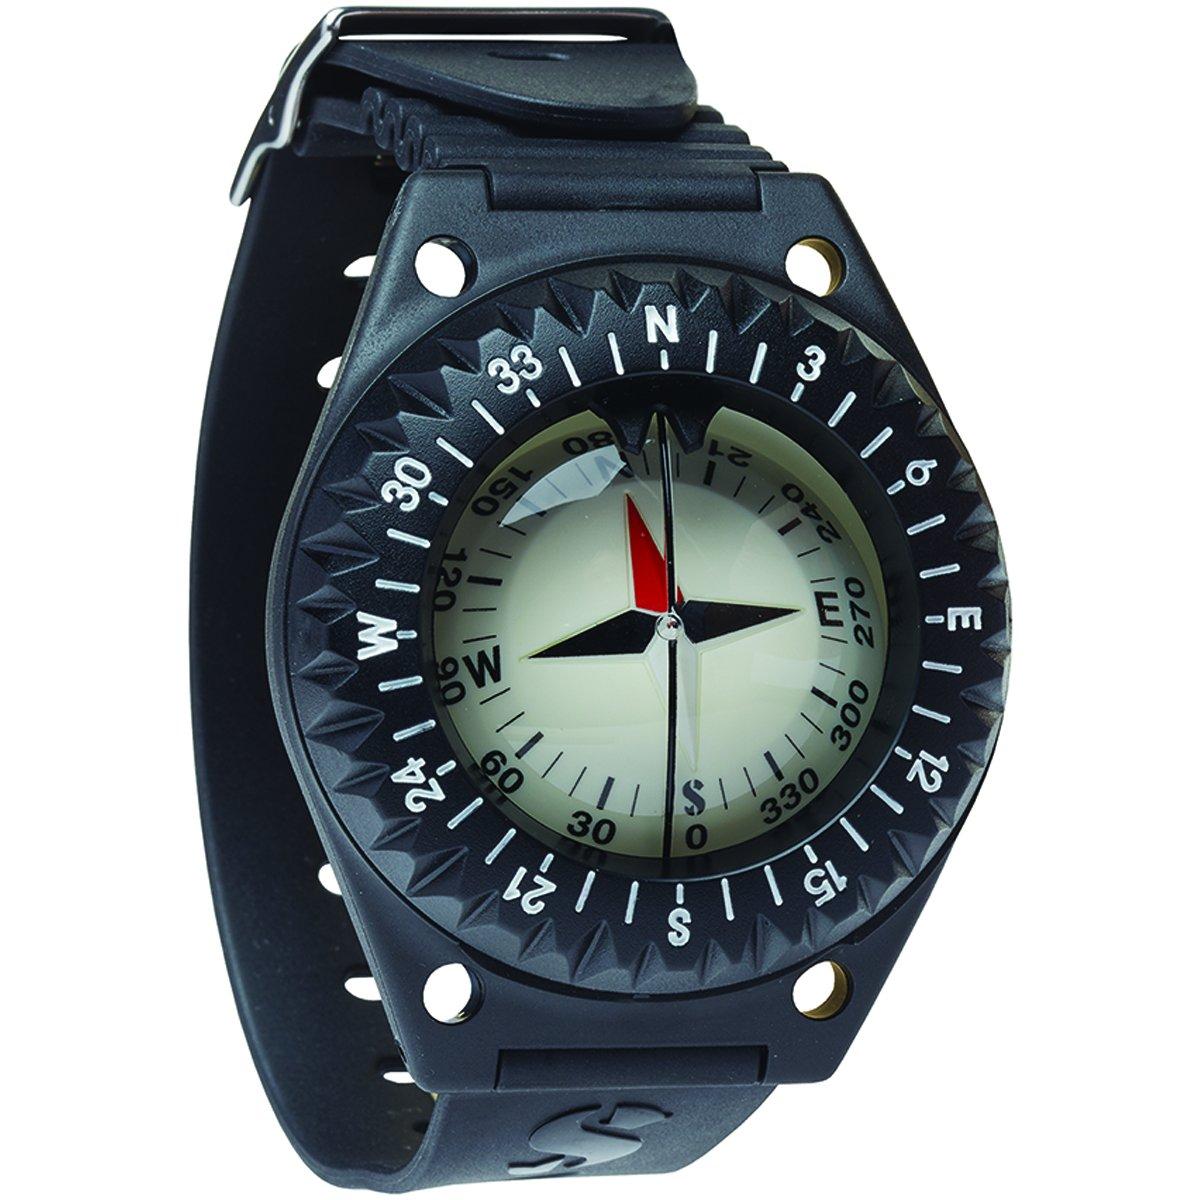 SCUBAPRO FS-1.5 Wrist Compass